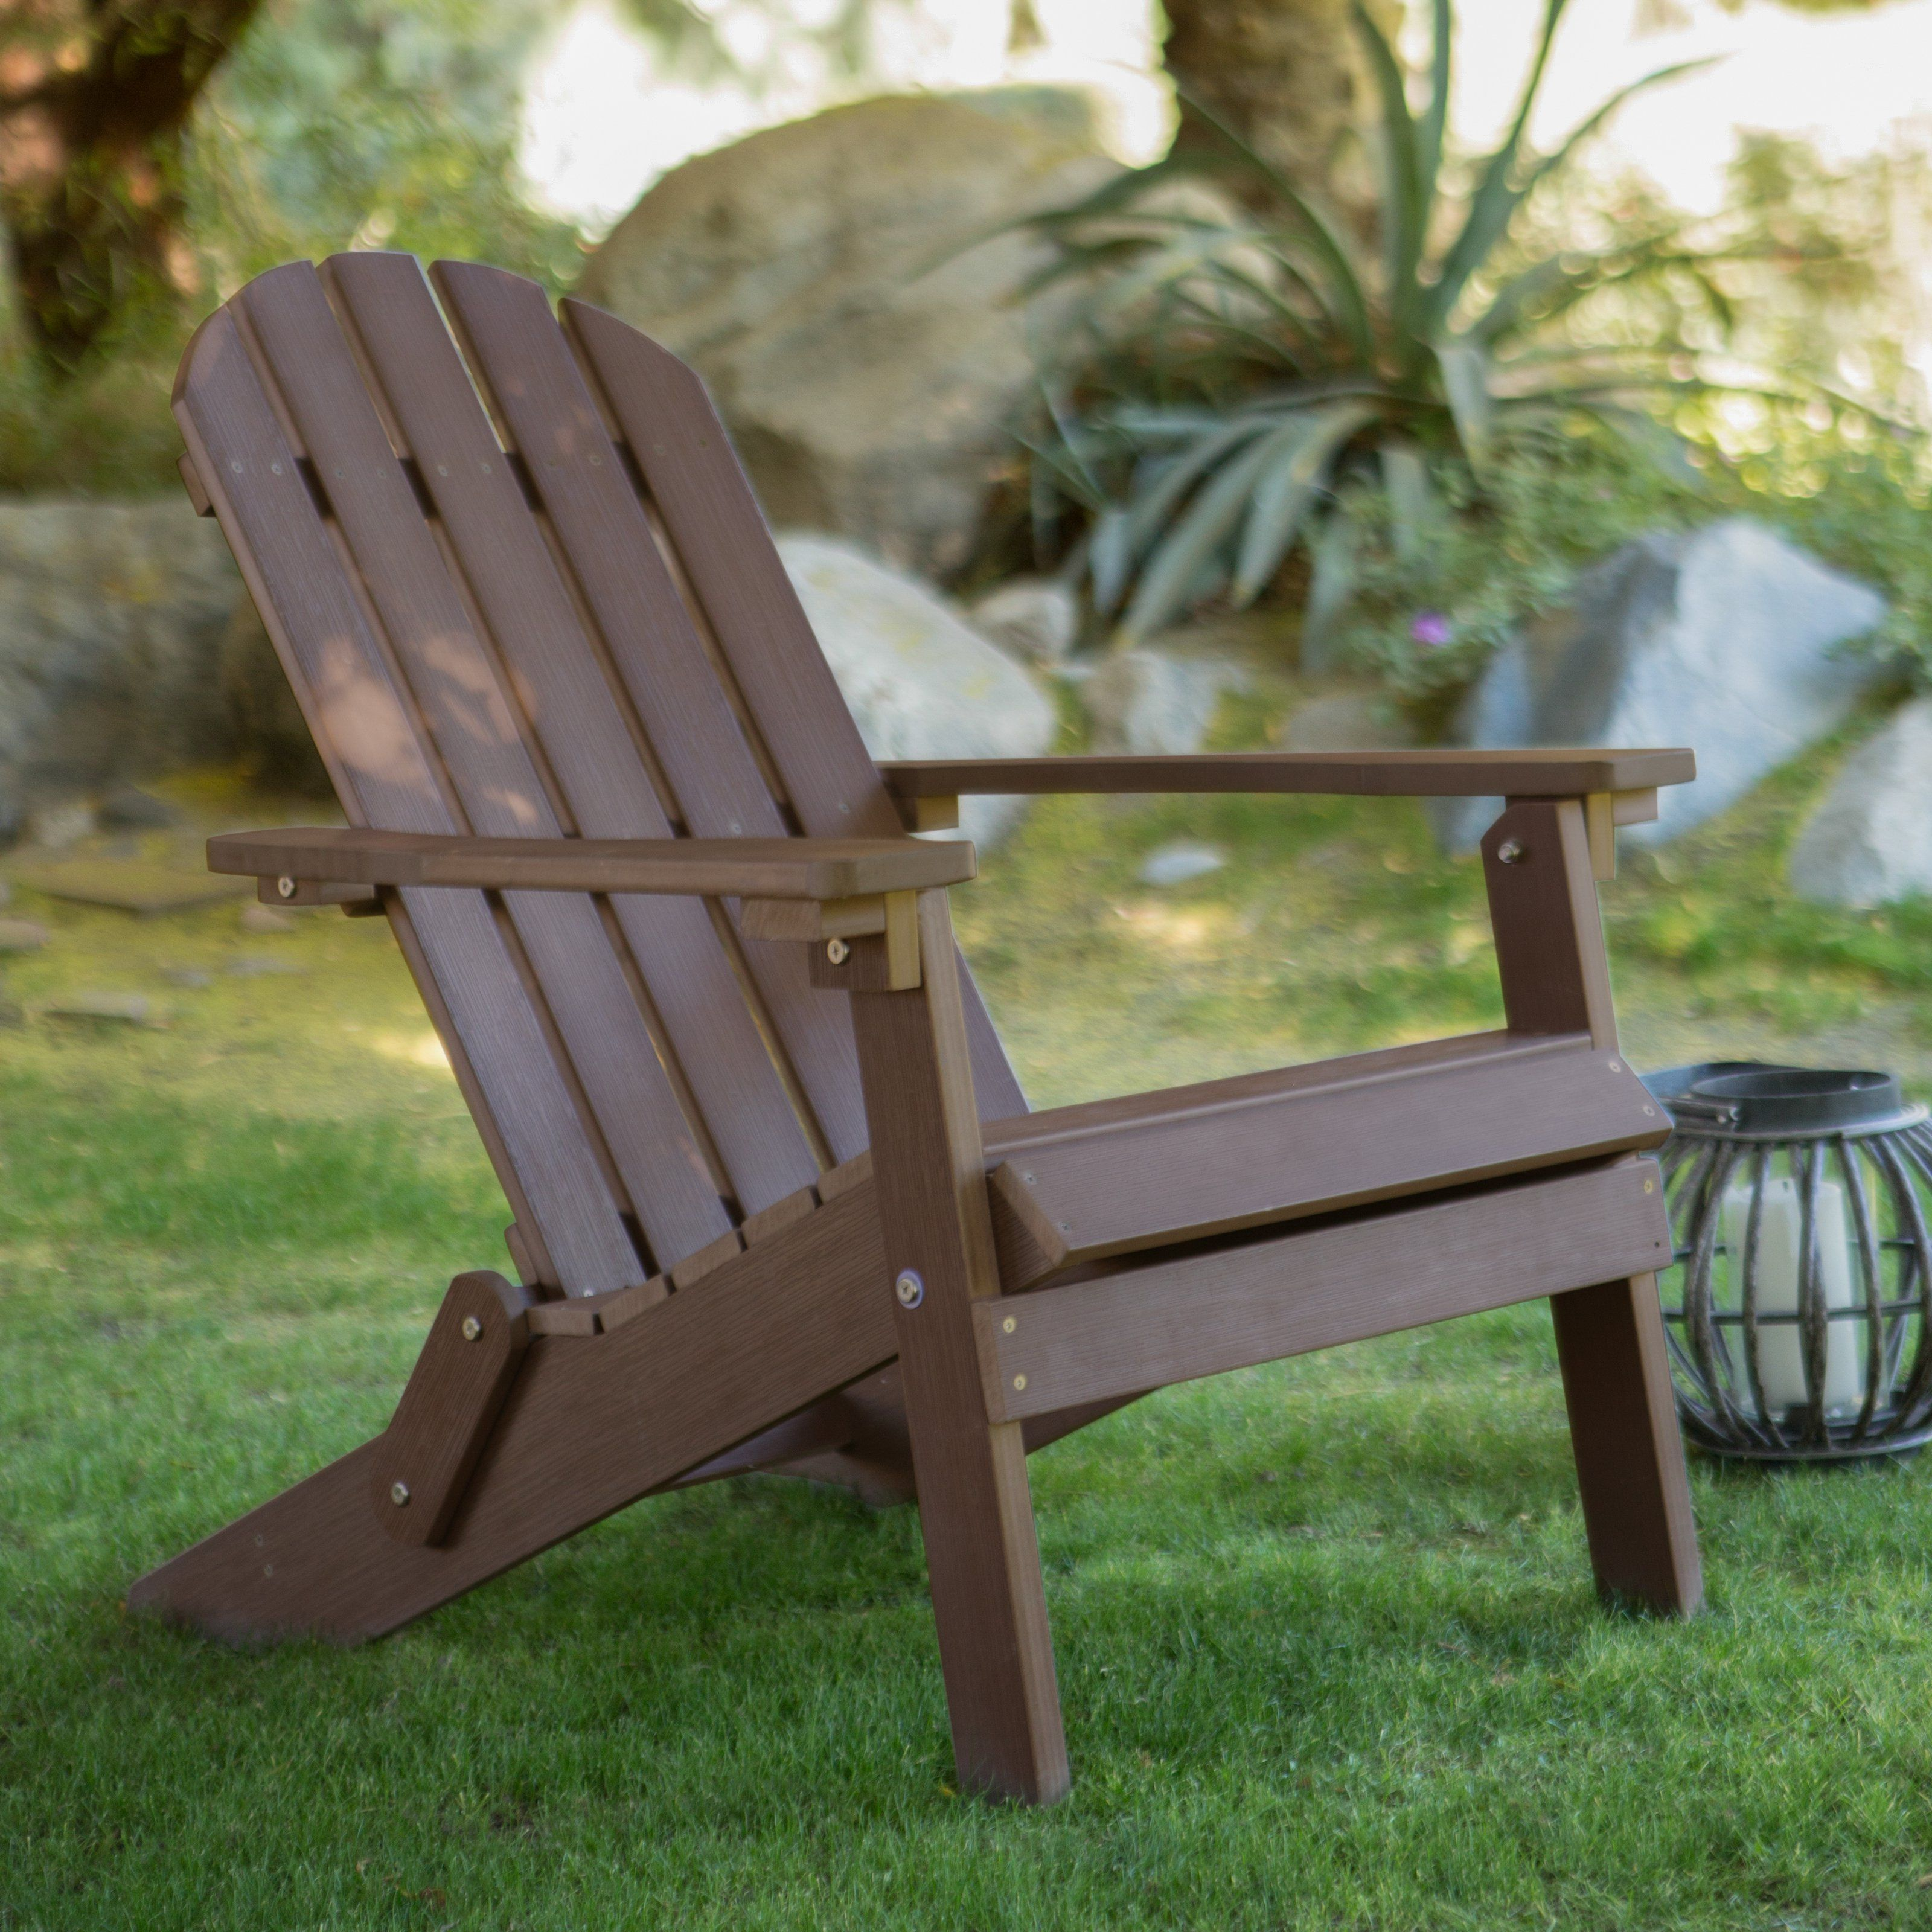 Belham Living All Weather Resin Adirondack Chair